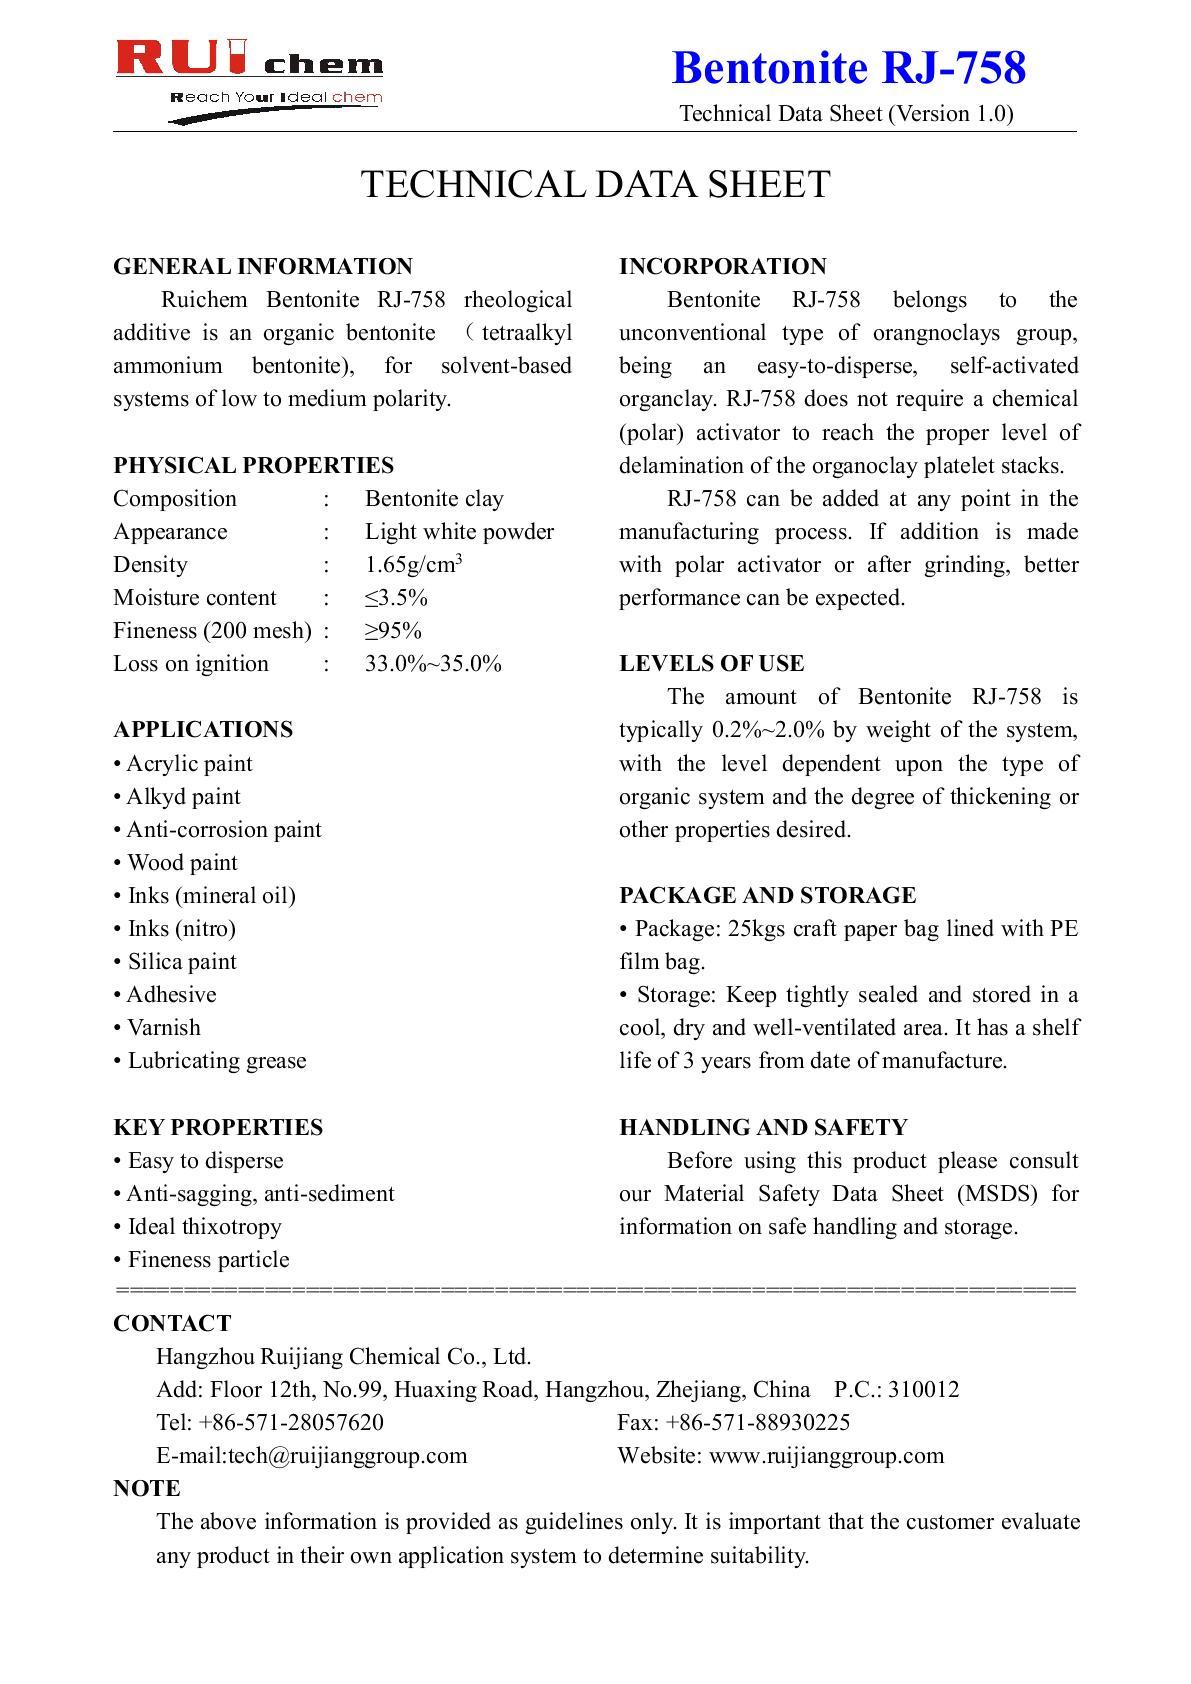 Organic bentonite RC—758_OKCHEM